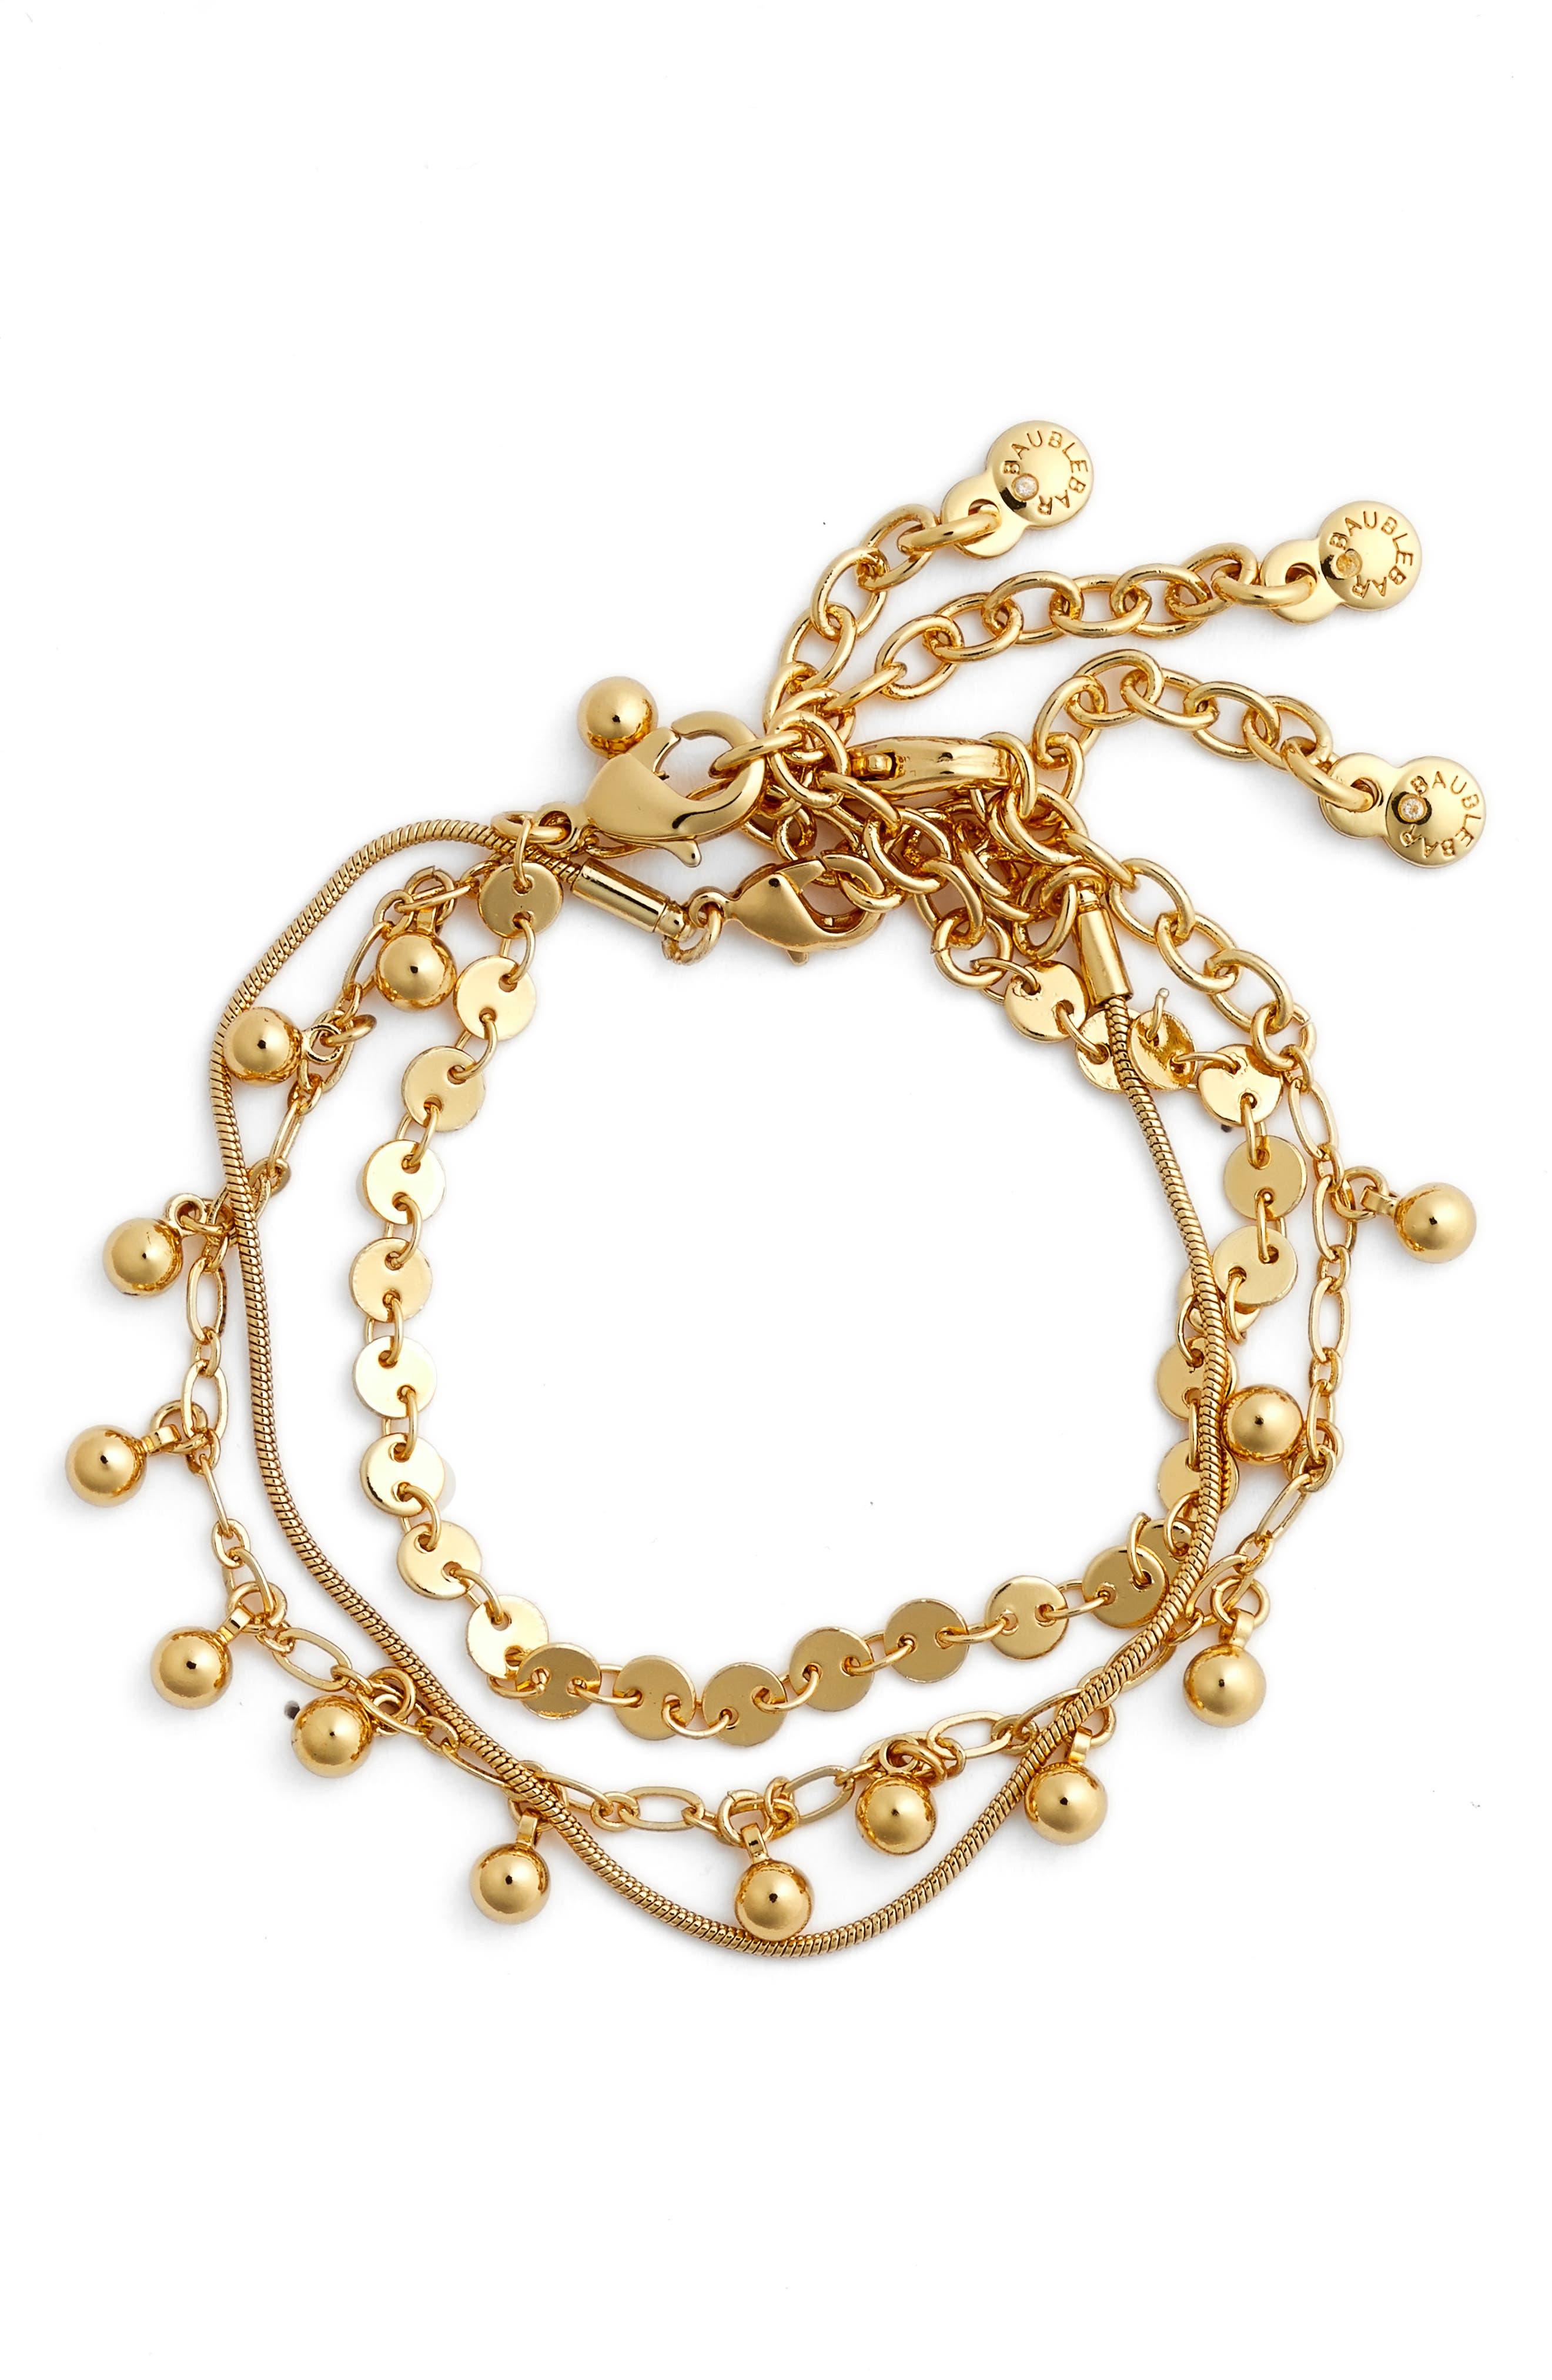 Asteria Set of 3 Bracelets,                             Main thumbnail 1, color,                             GOLD